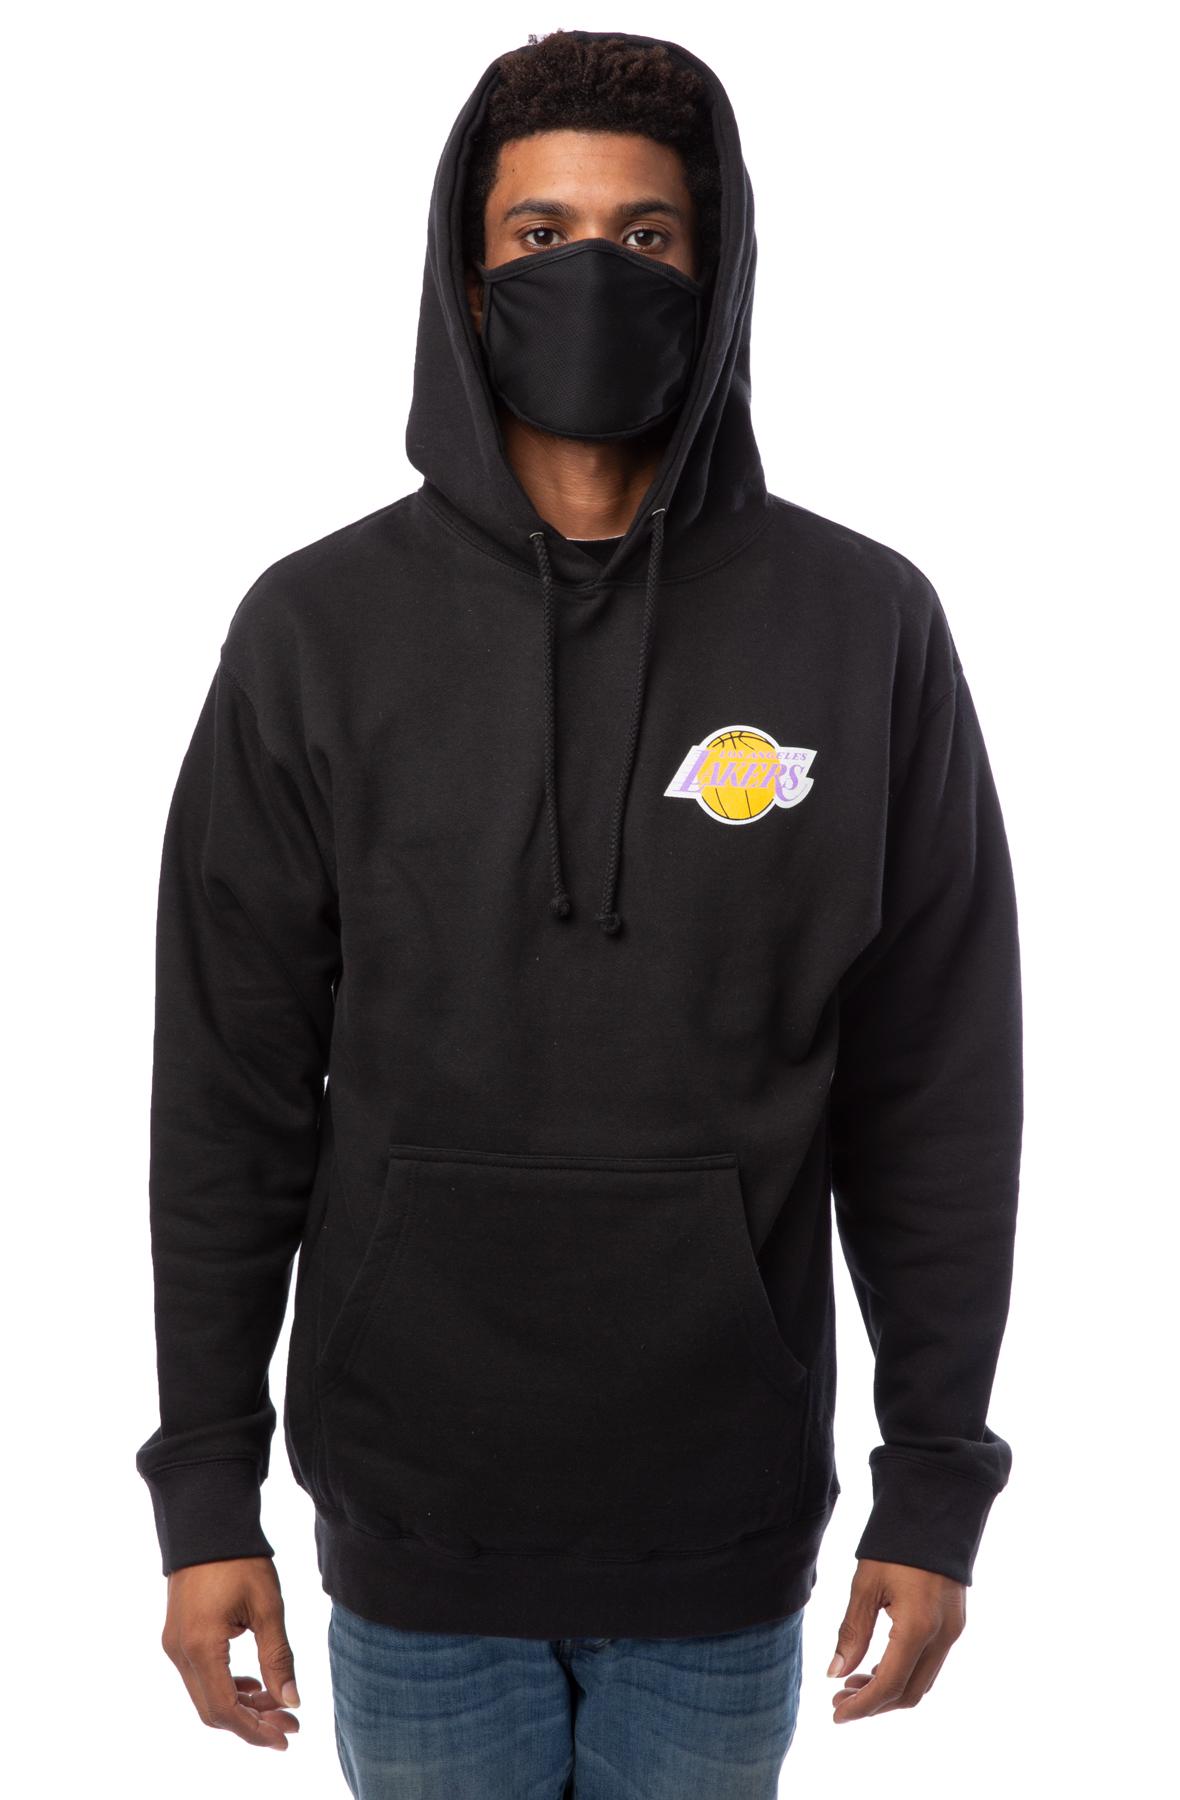 NBA Showtime 17x Lakers Hoodie